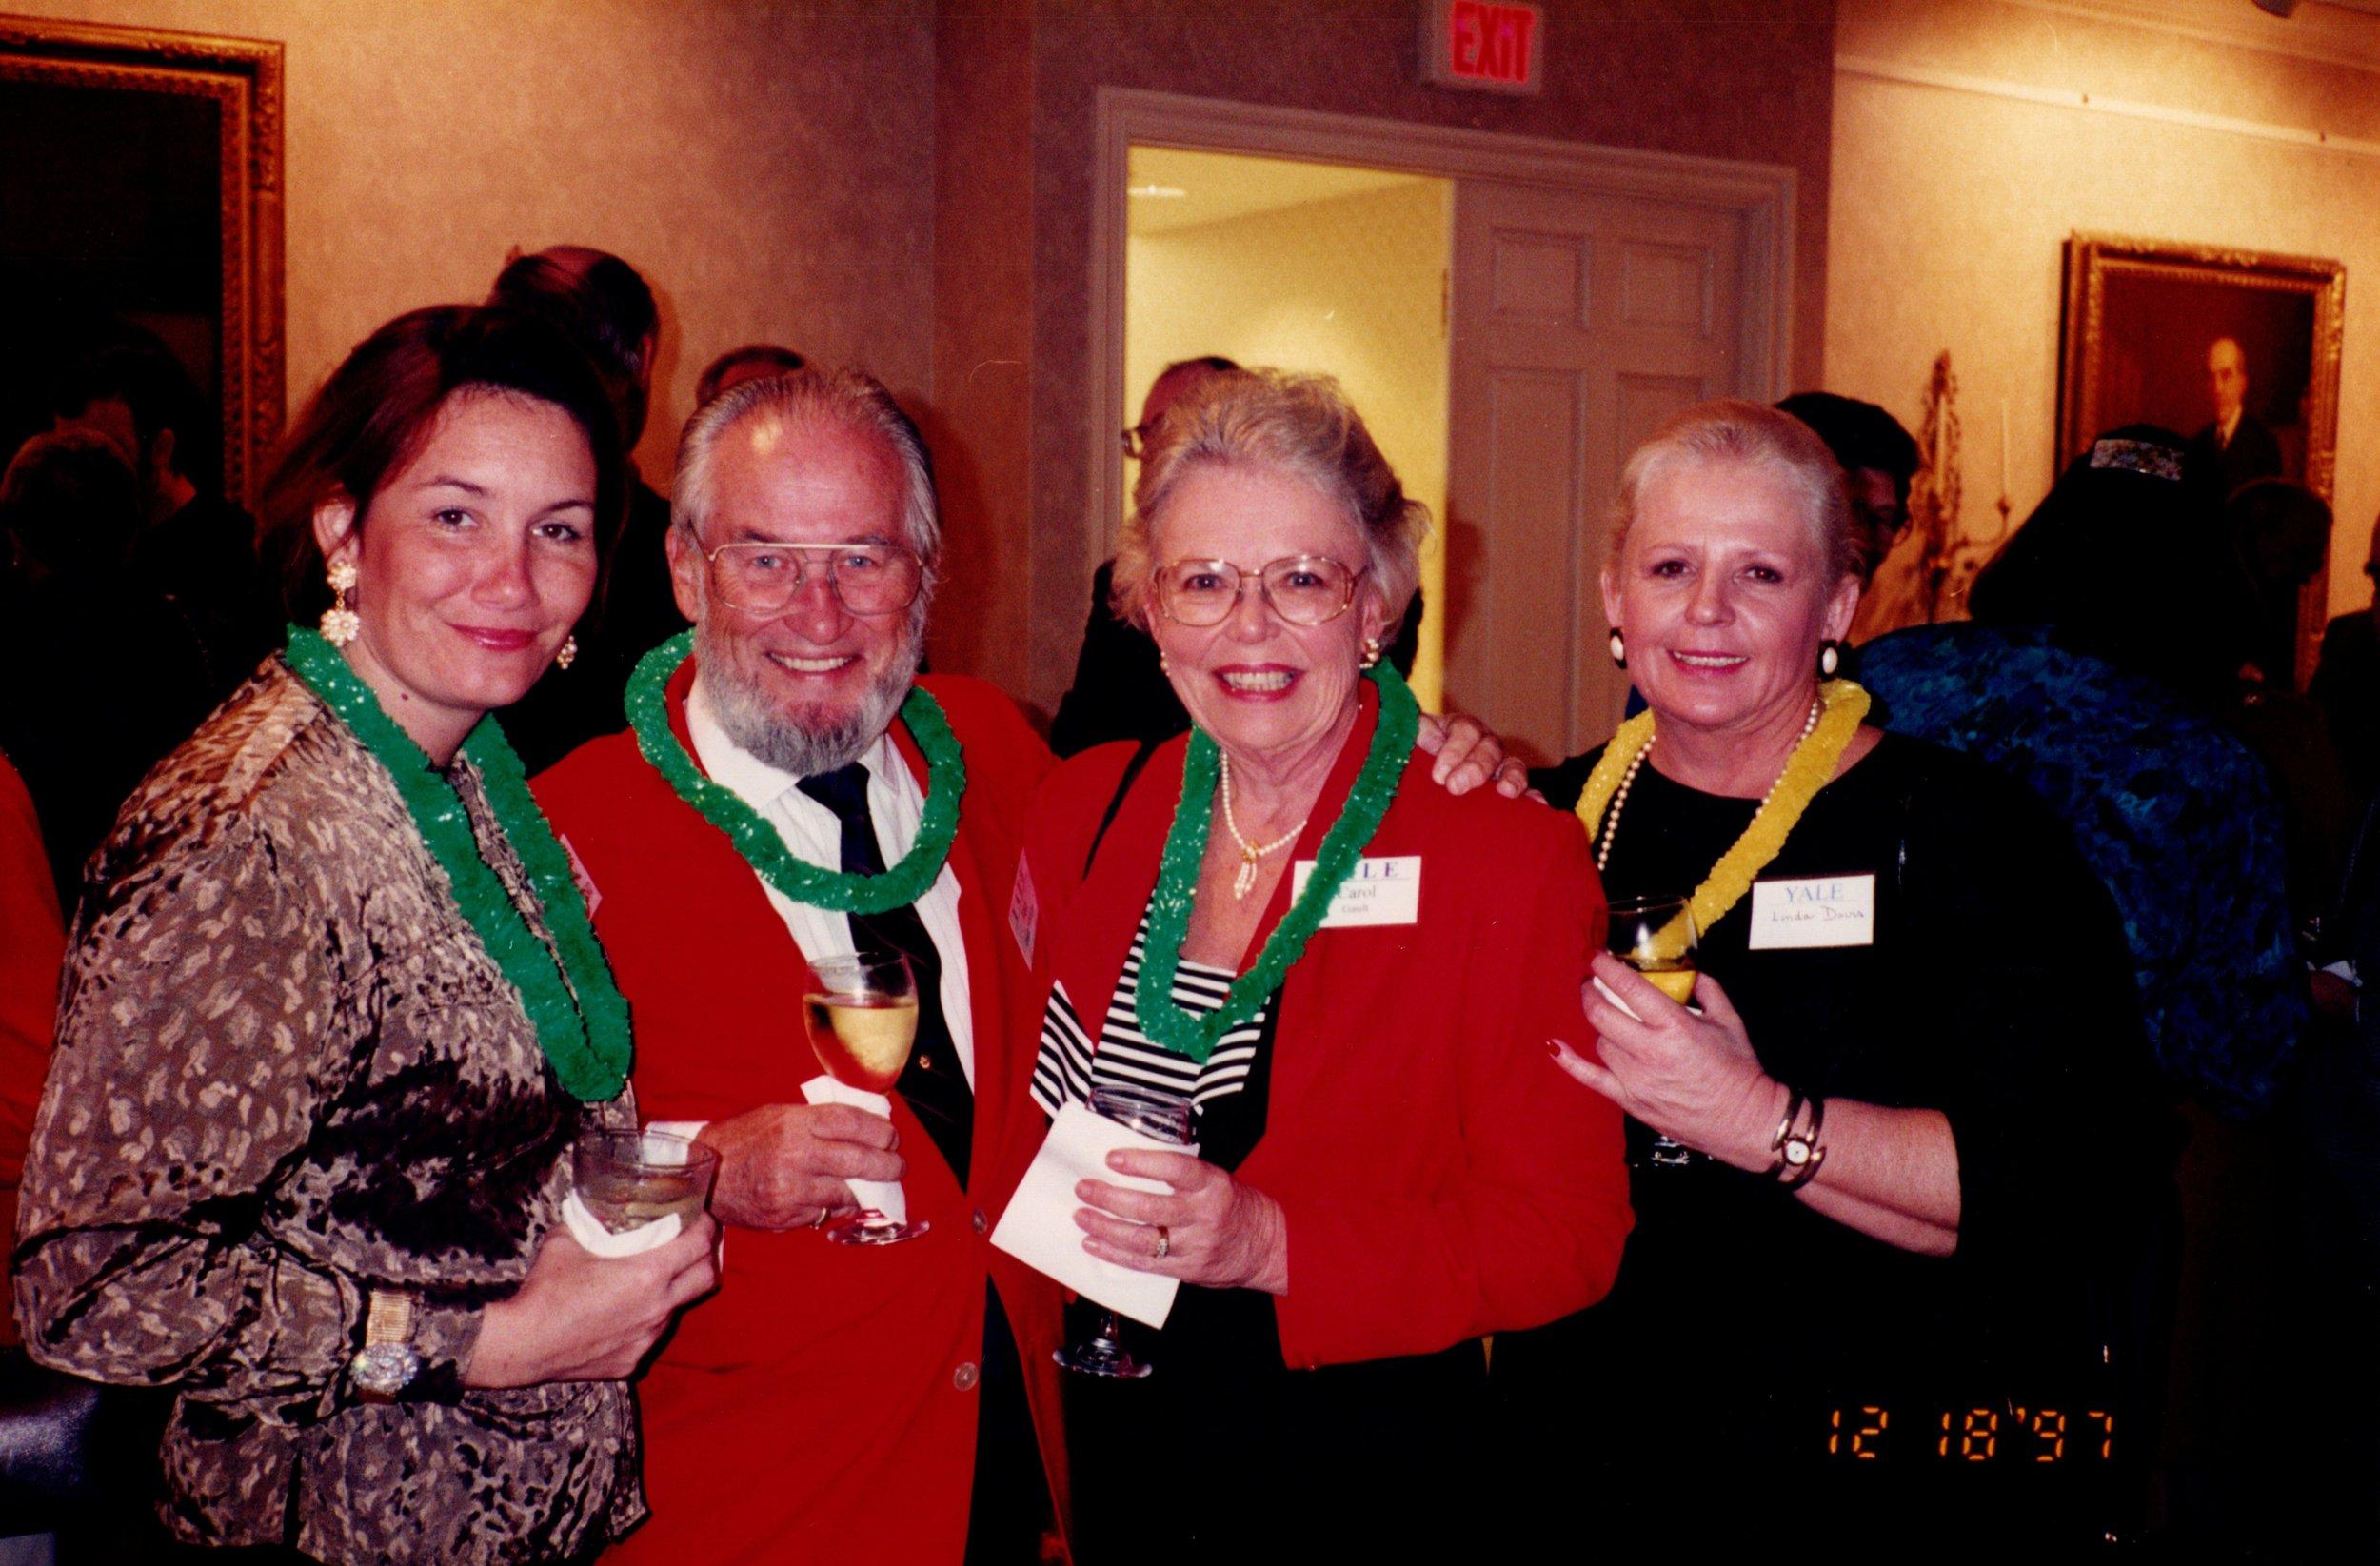 LISA BALDWIN, TED GAULT '54MDIV, CAROL GAULT, LINDA DAVIS